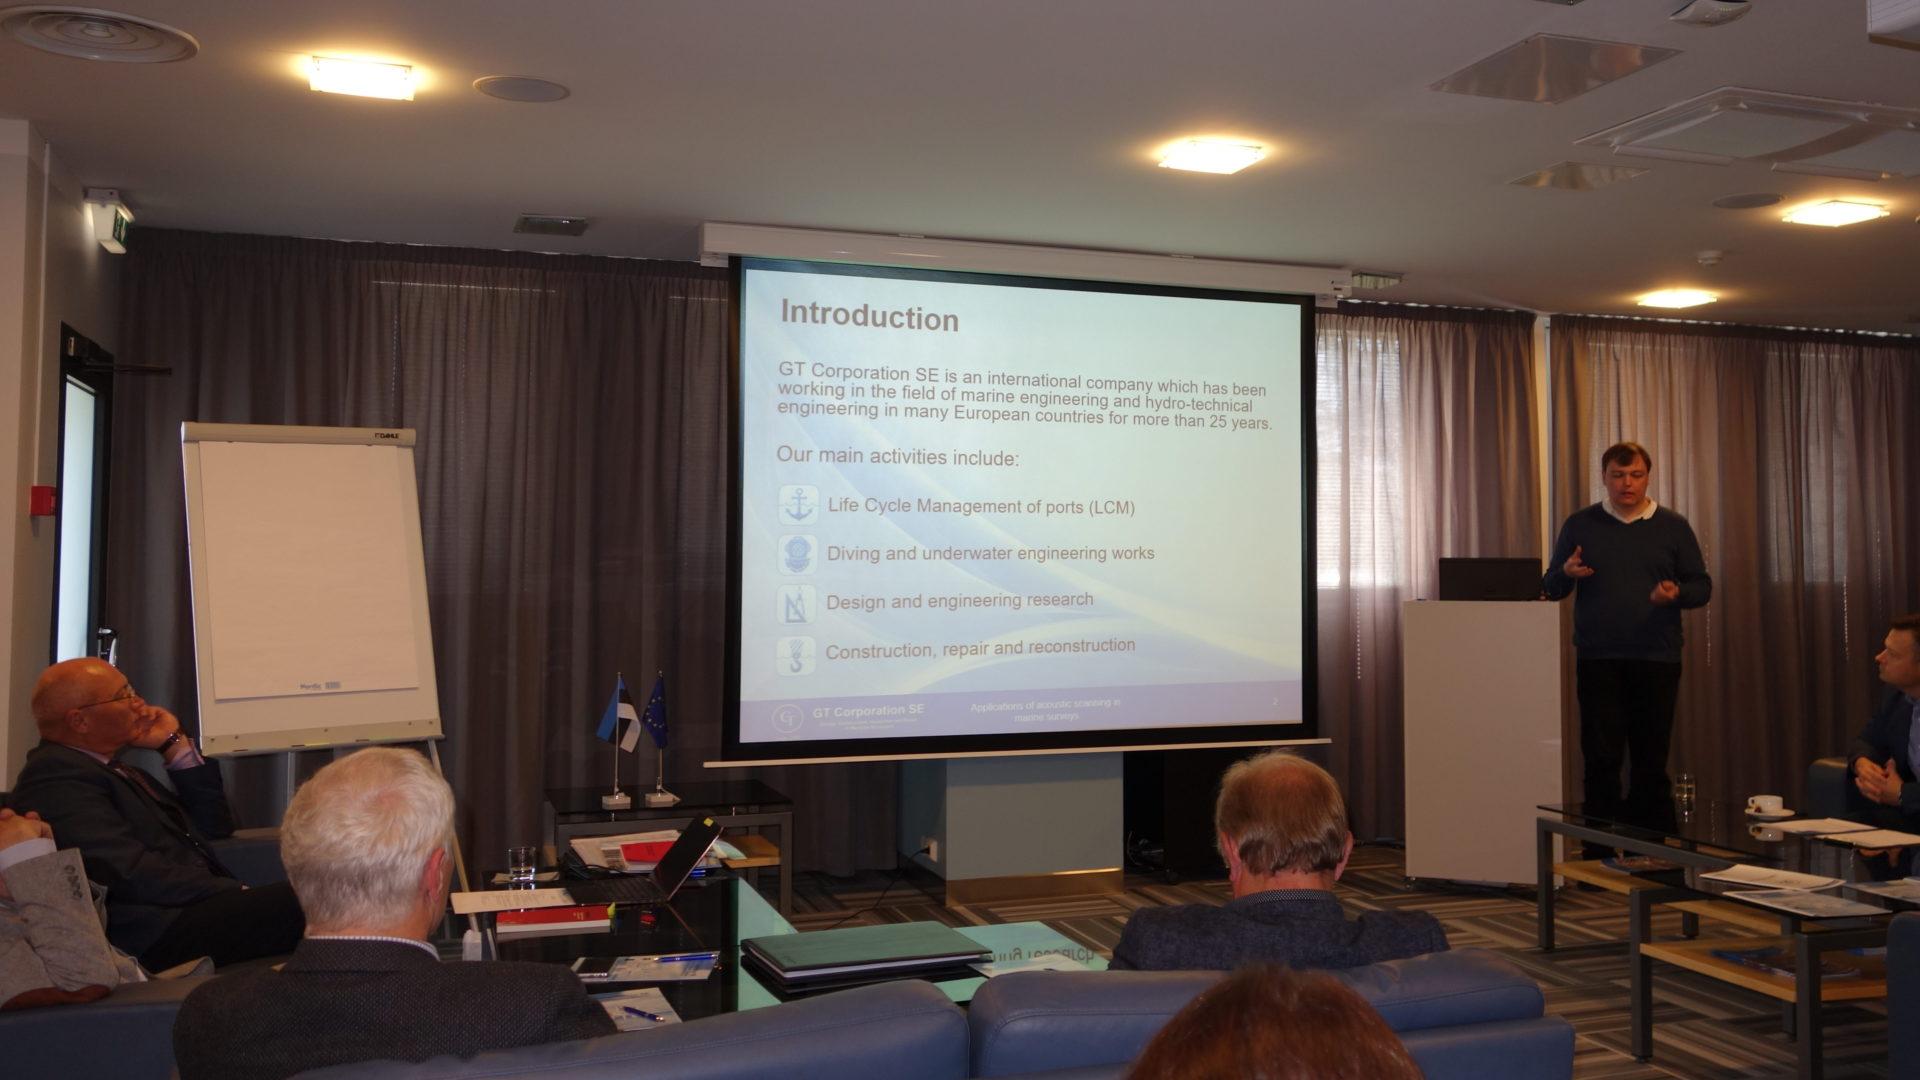 Presentation by Igor Burovenko, IT Coordinator at GT Corporation SE